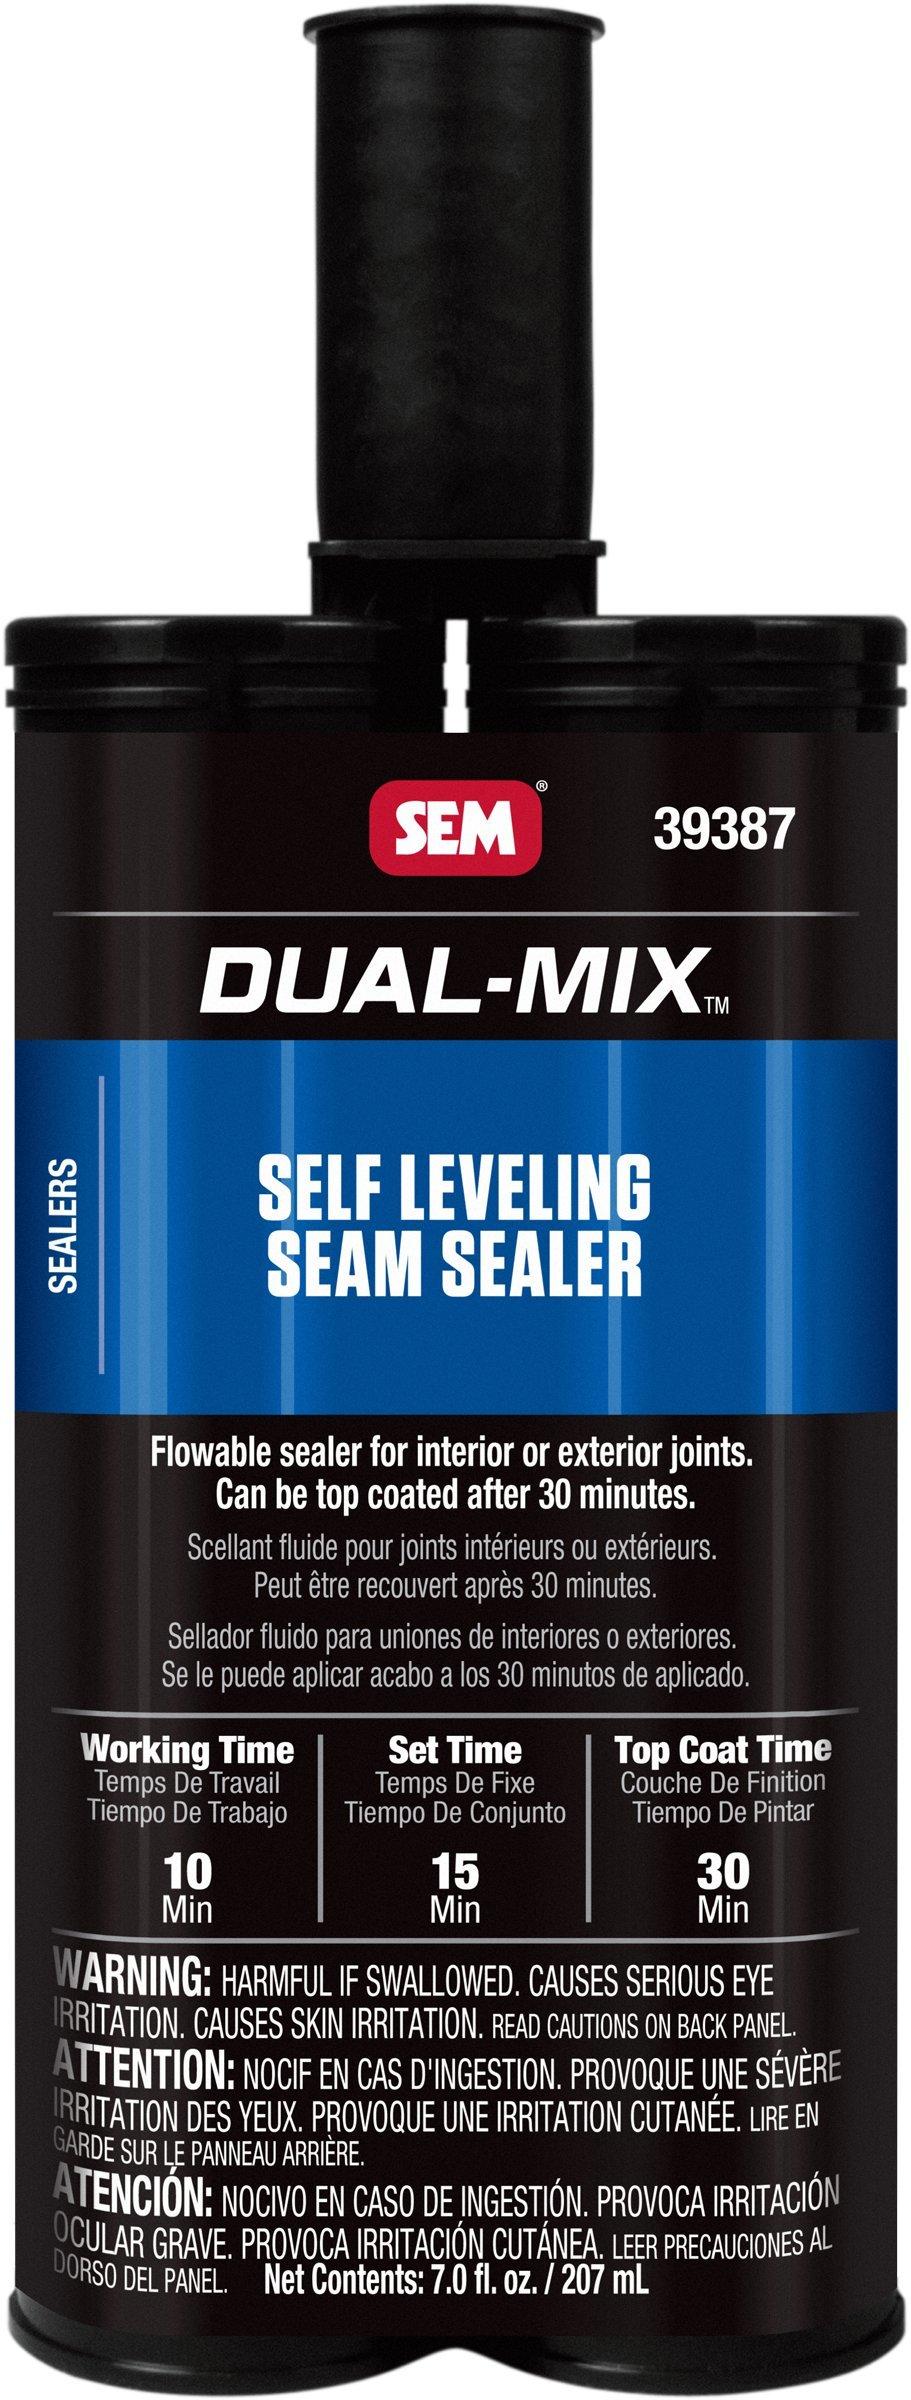 SEM 39387 Self Leveling Seam Sealer, 7 oz by SEM